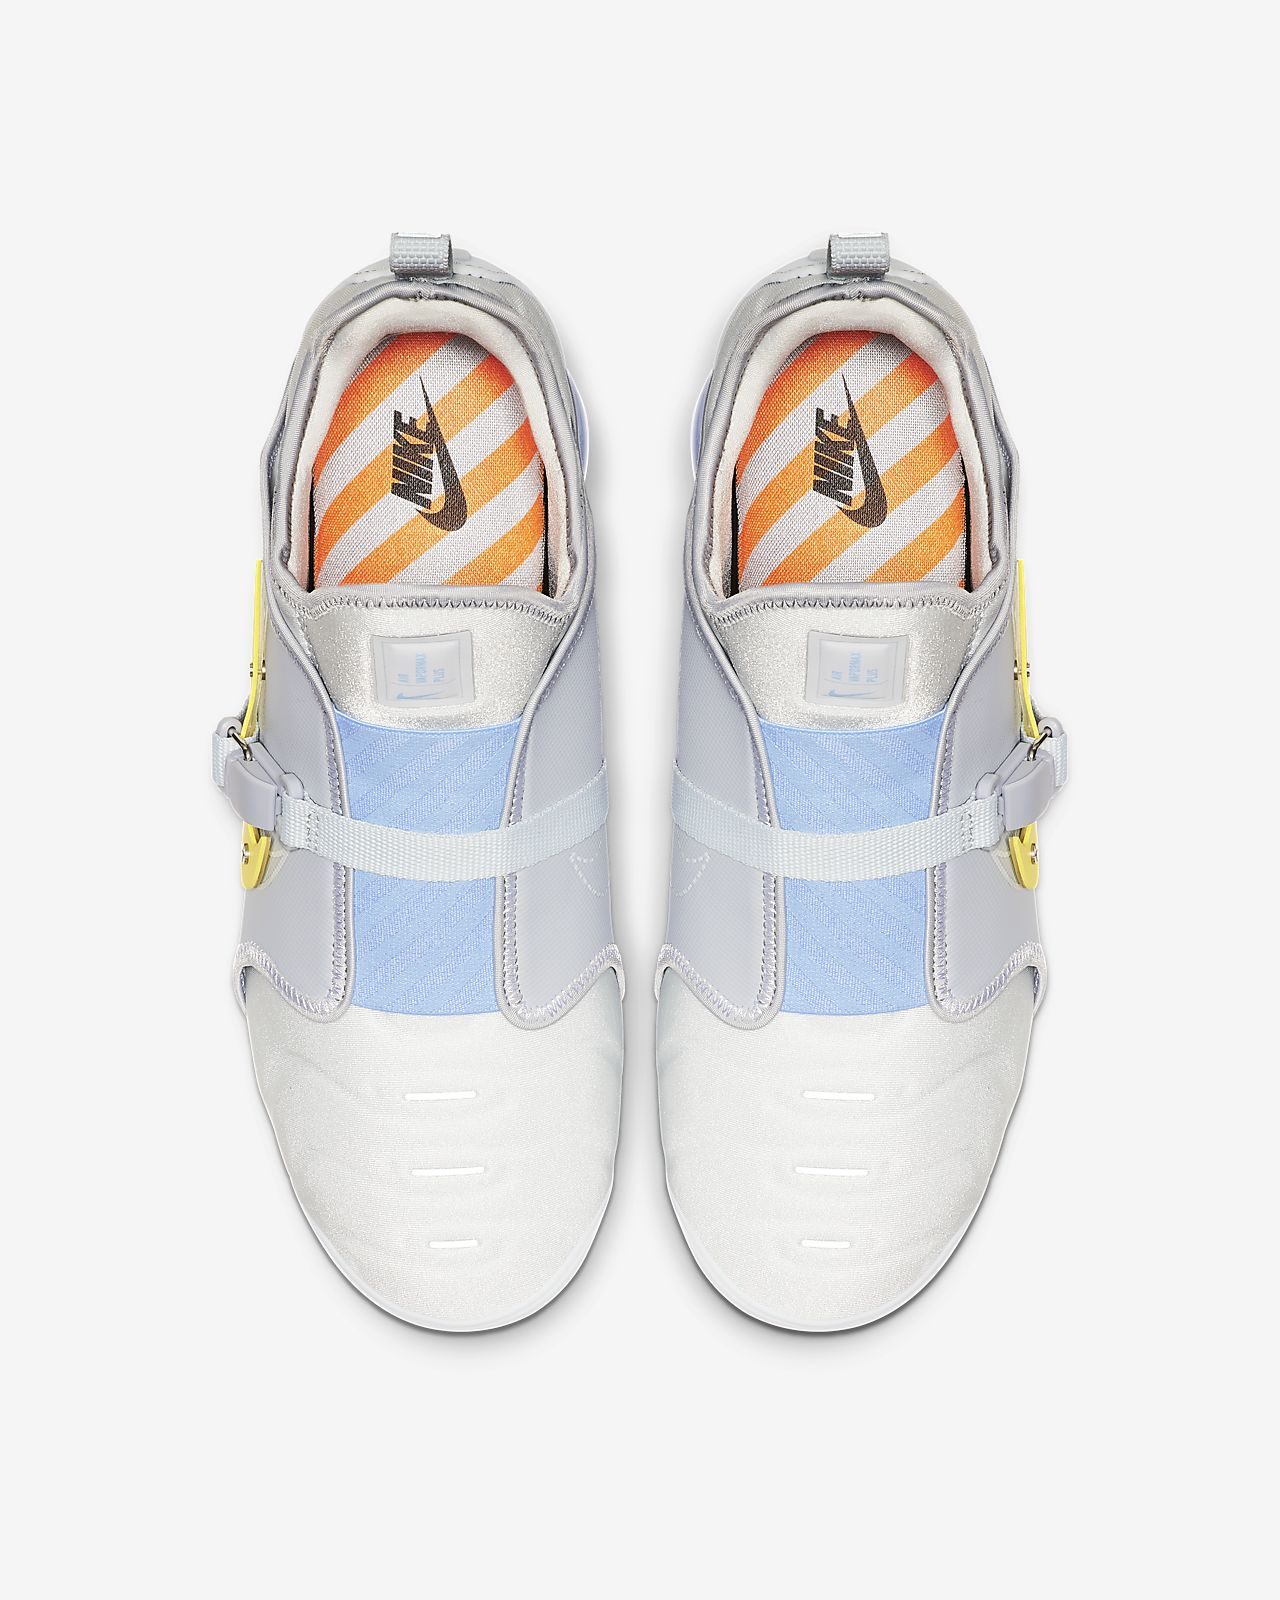 Sapatilhas Nike Air VaporMax Plus On Air Lou Matheron